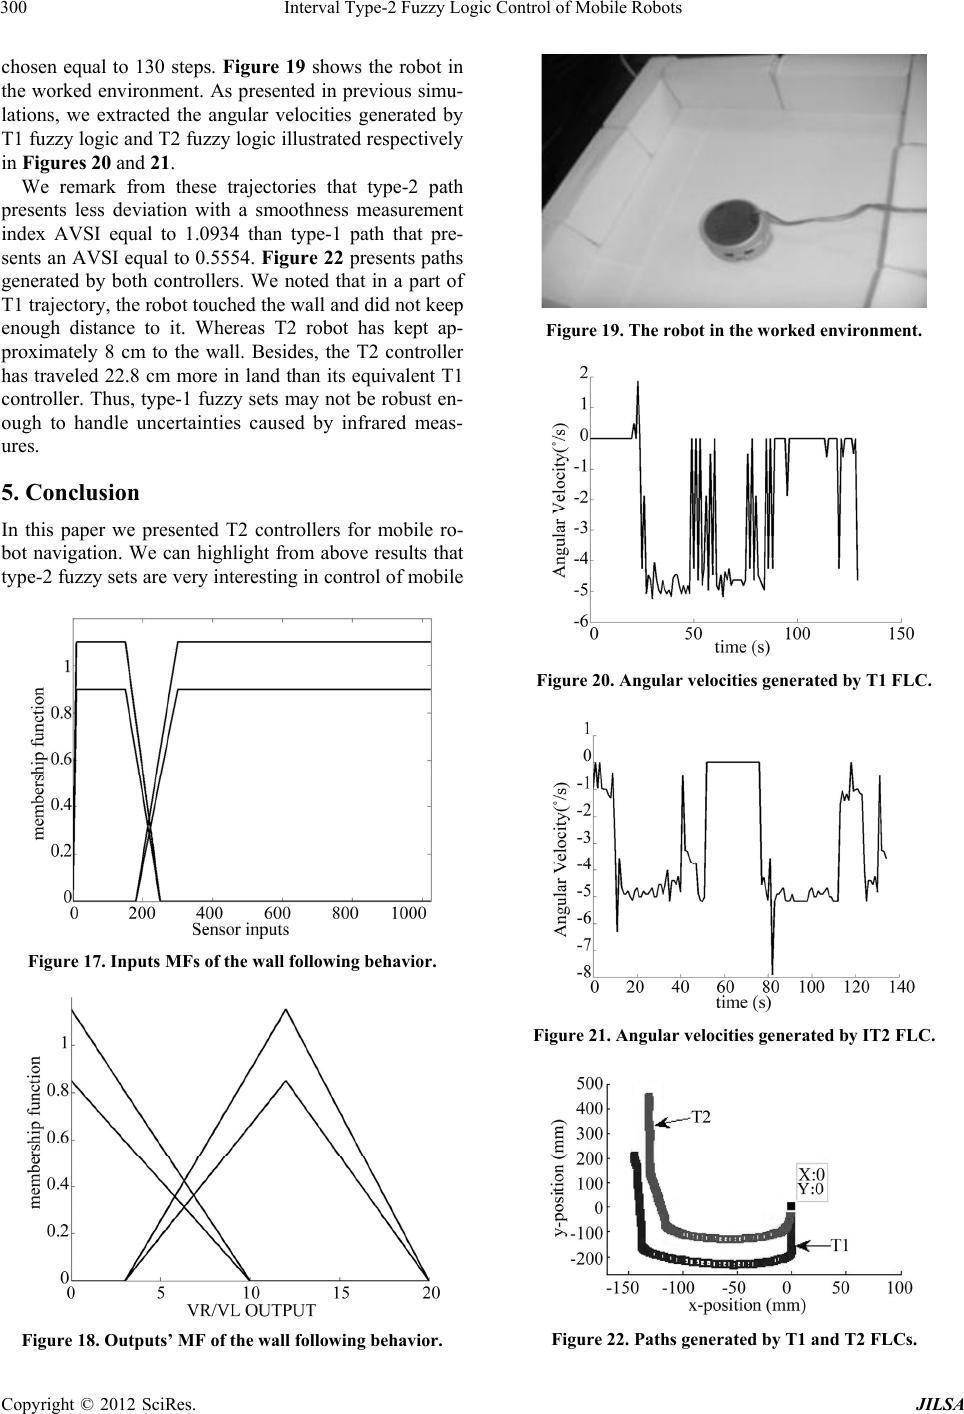 Interval Type 2 Fuzzy Logic Control Of Mobile Robots Diagram